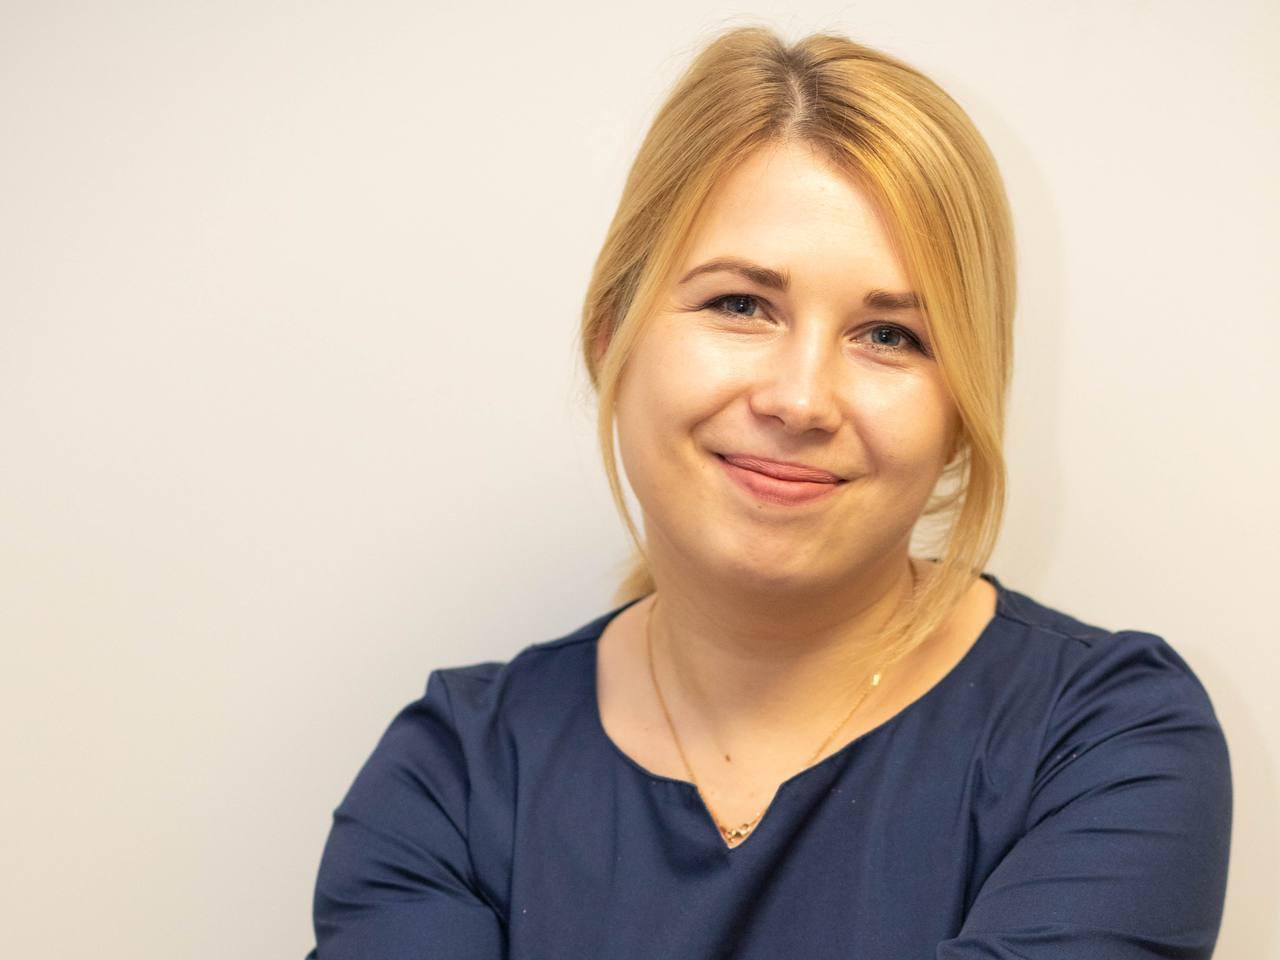 Стоматолог Коркач Галина Николаевна